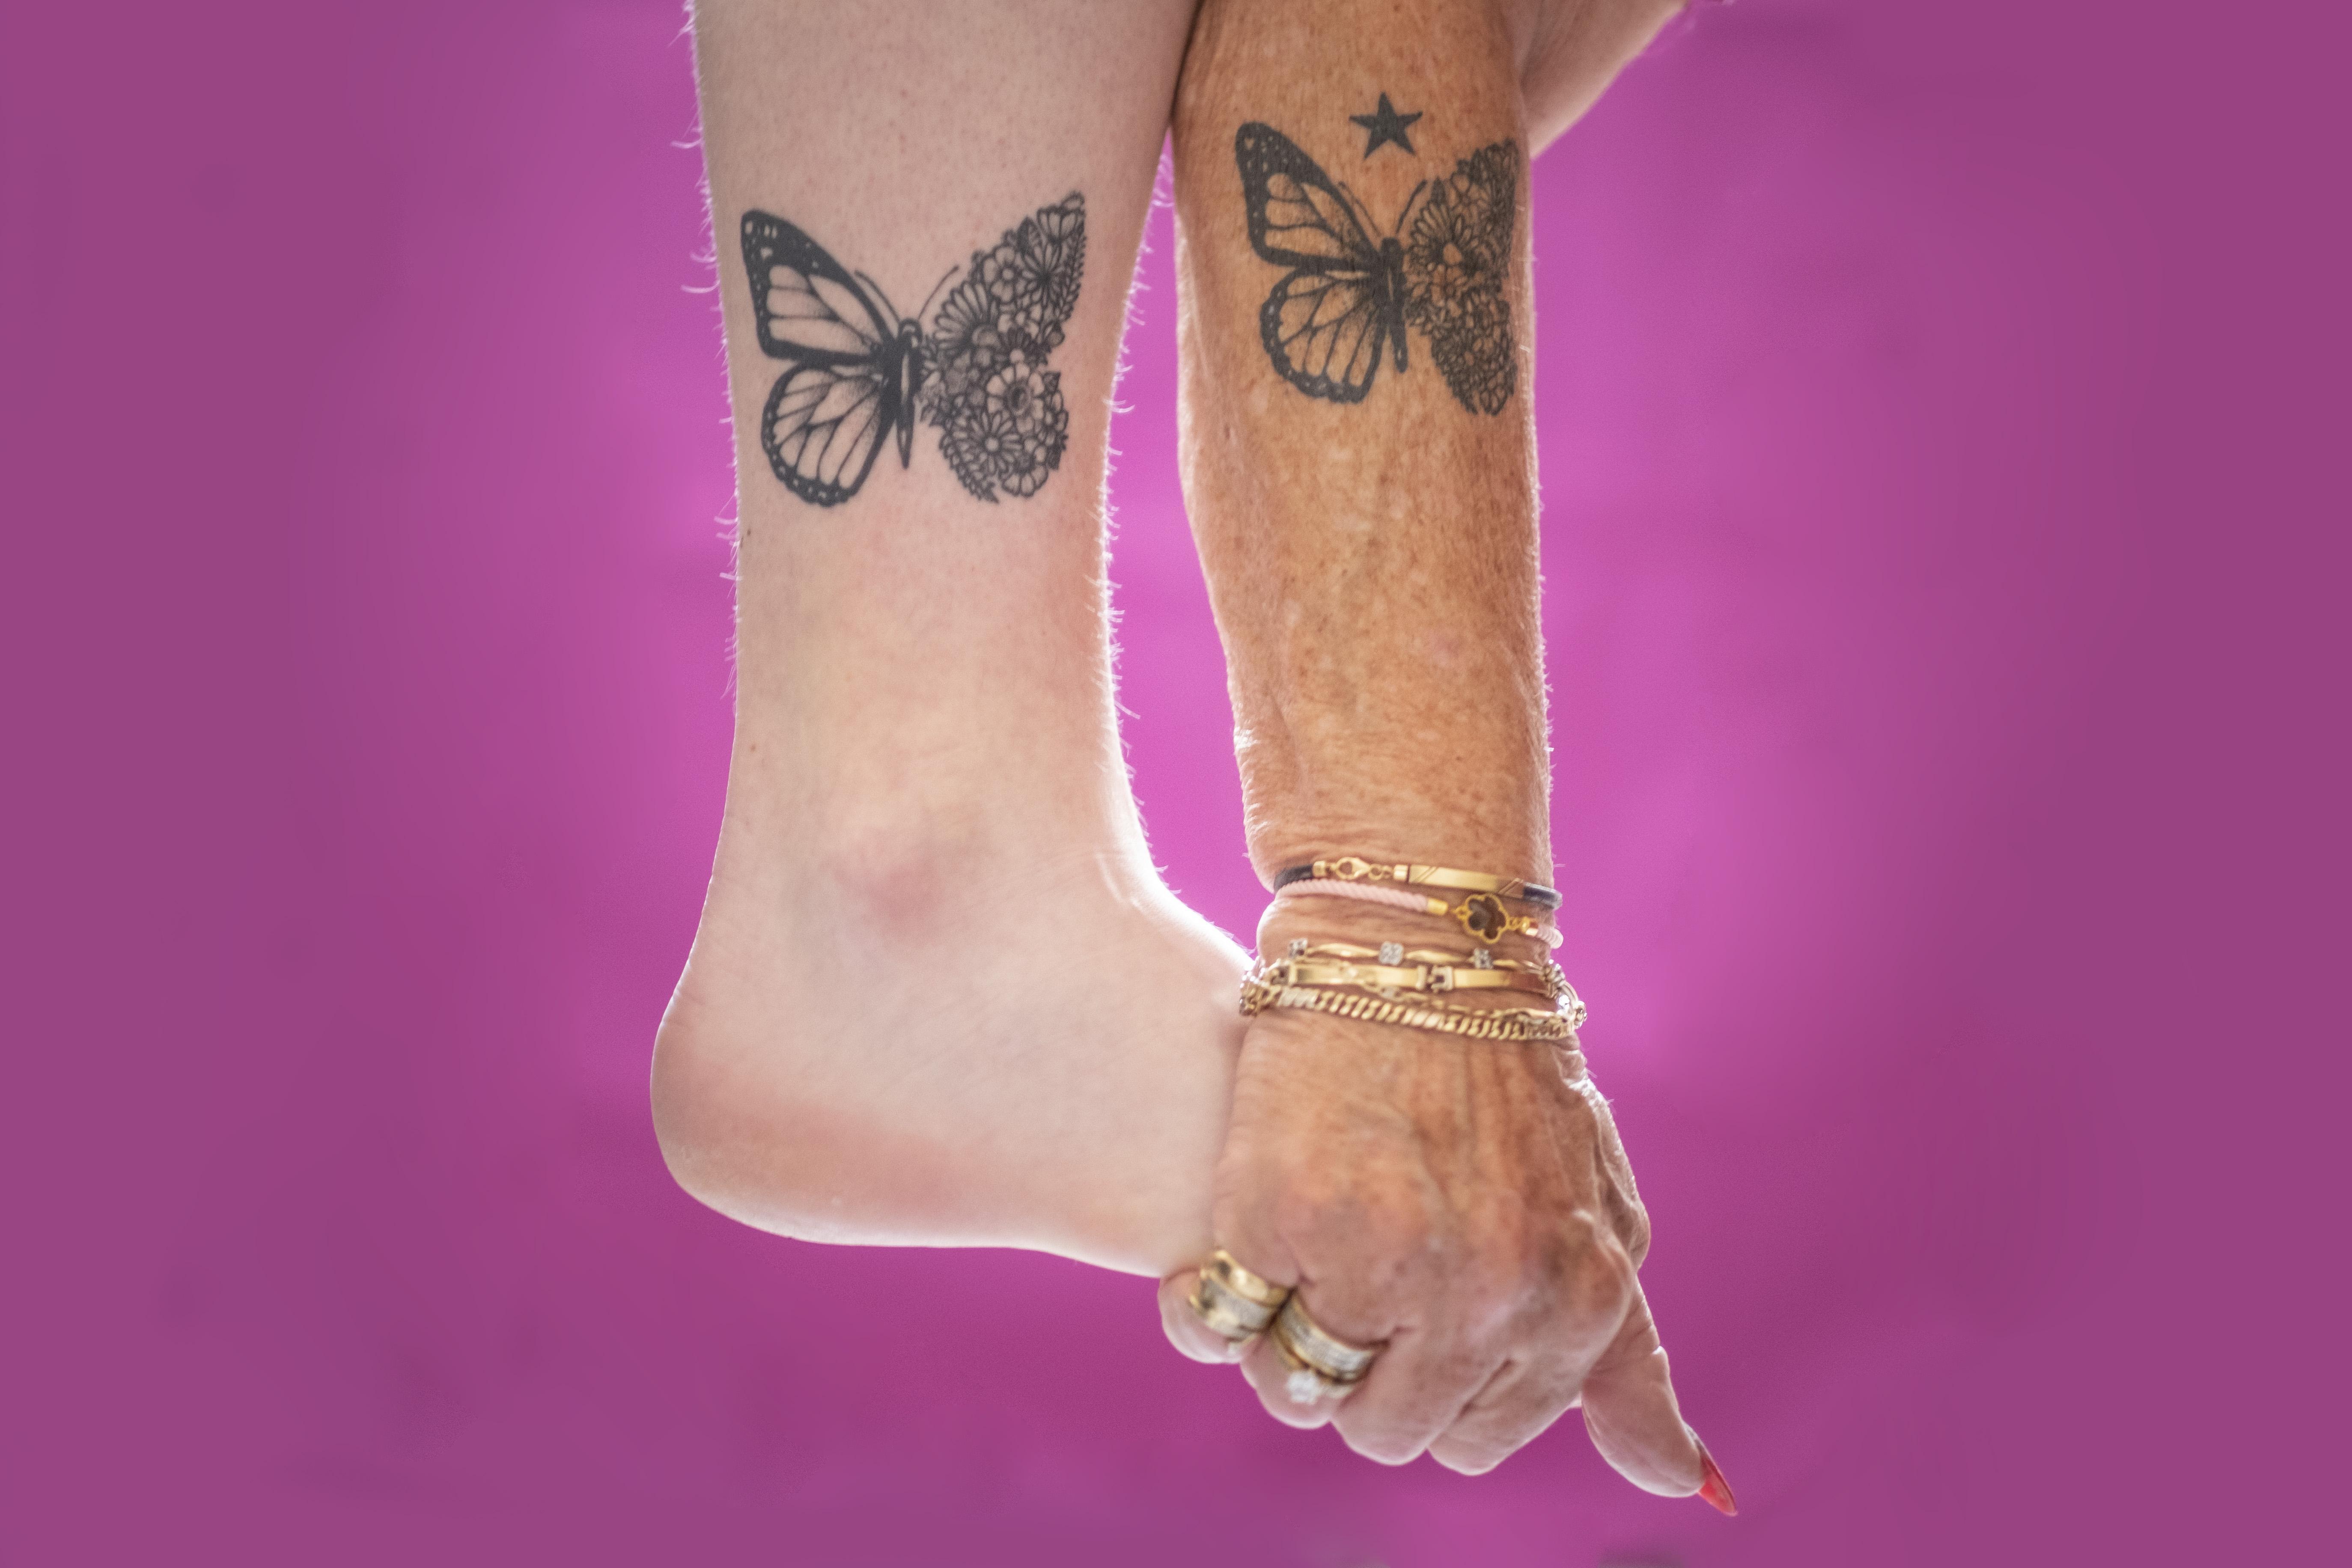 Oma Elly (76) en kleindochter Charelle (19) hebben dezelfde tattoo